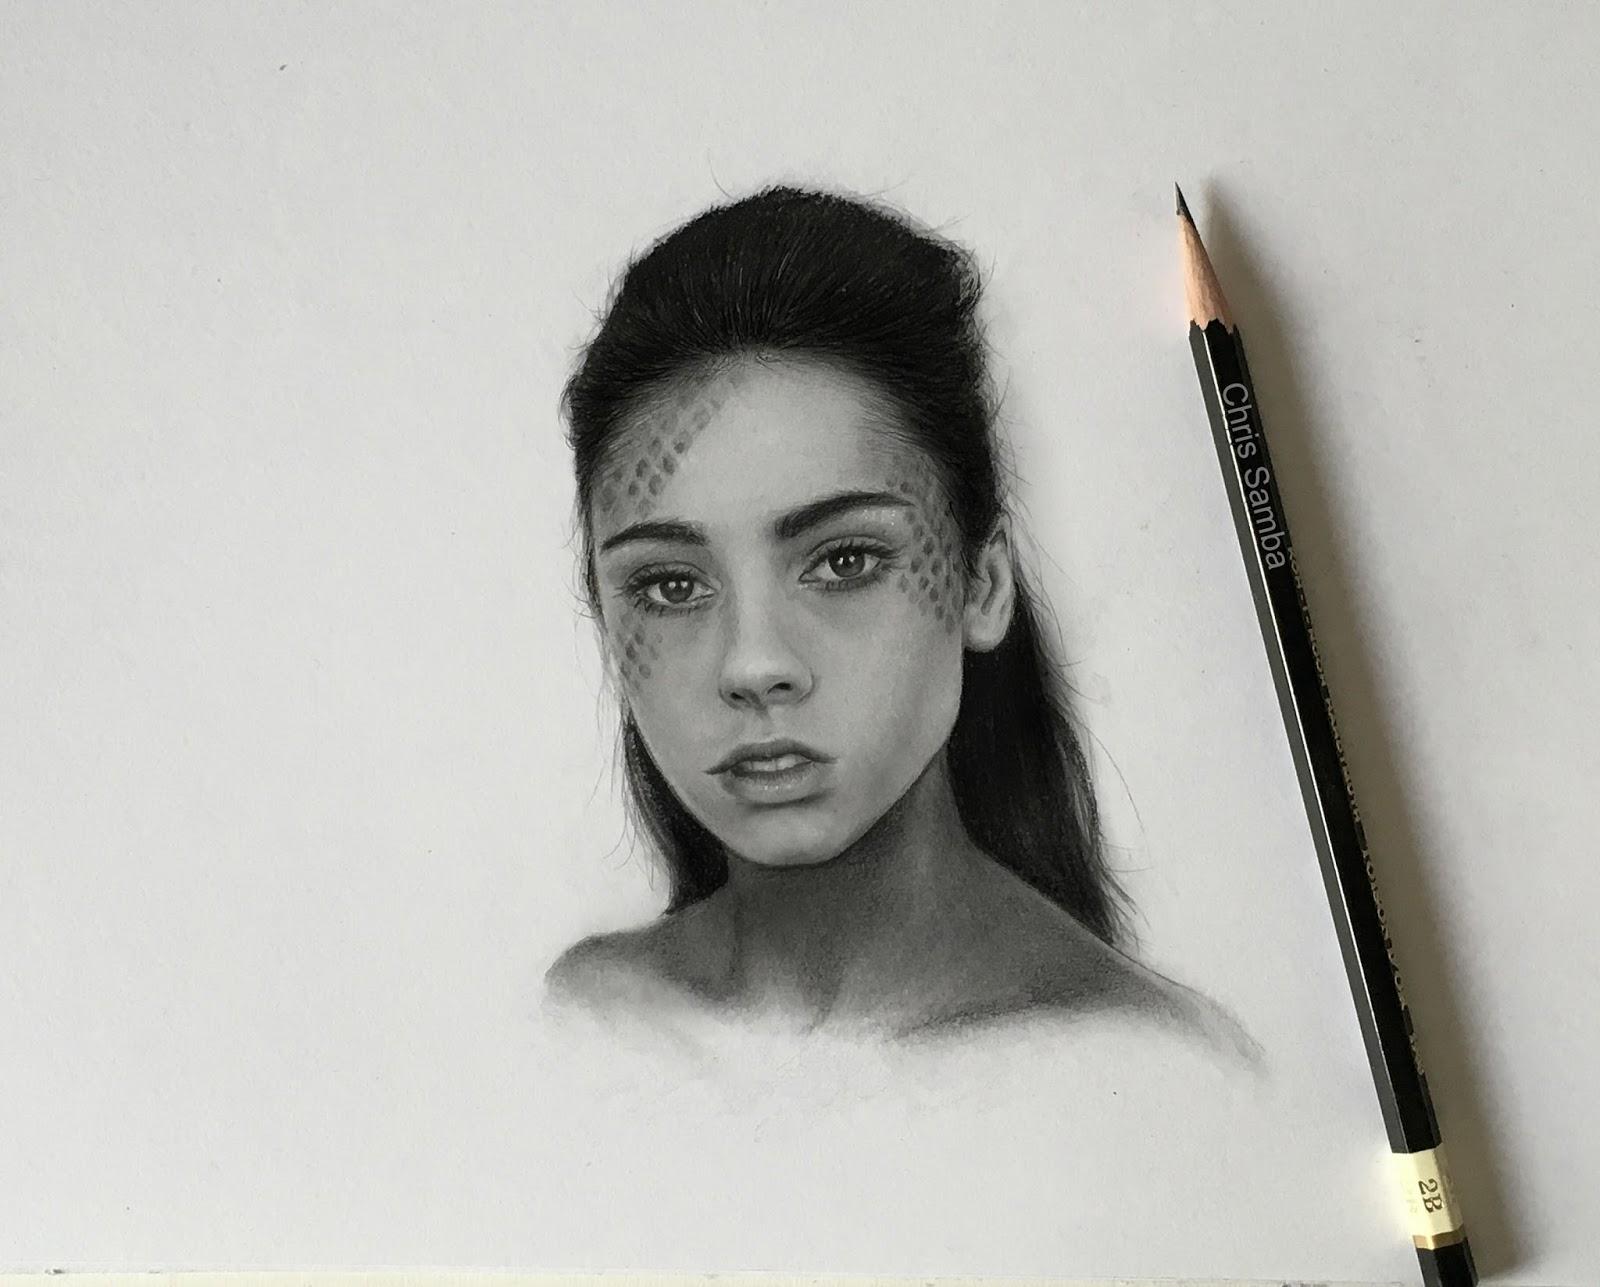 Chris samba art channel small pencil drawing for Small art drawings